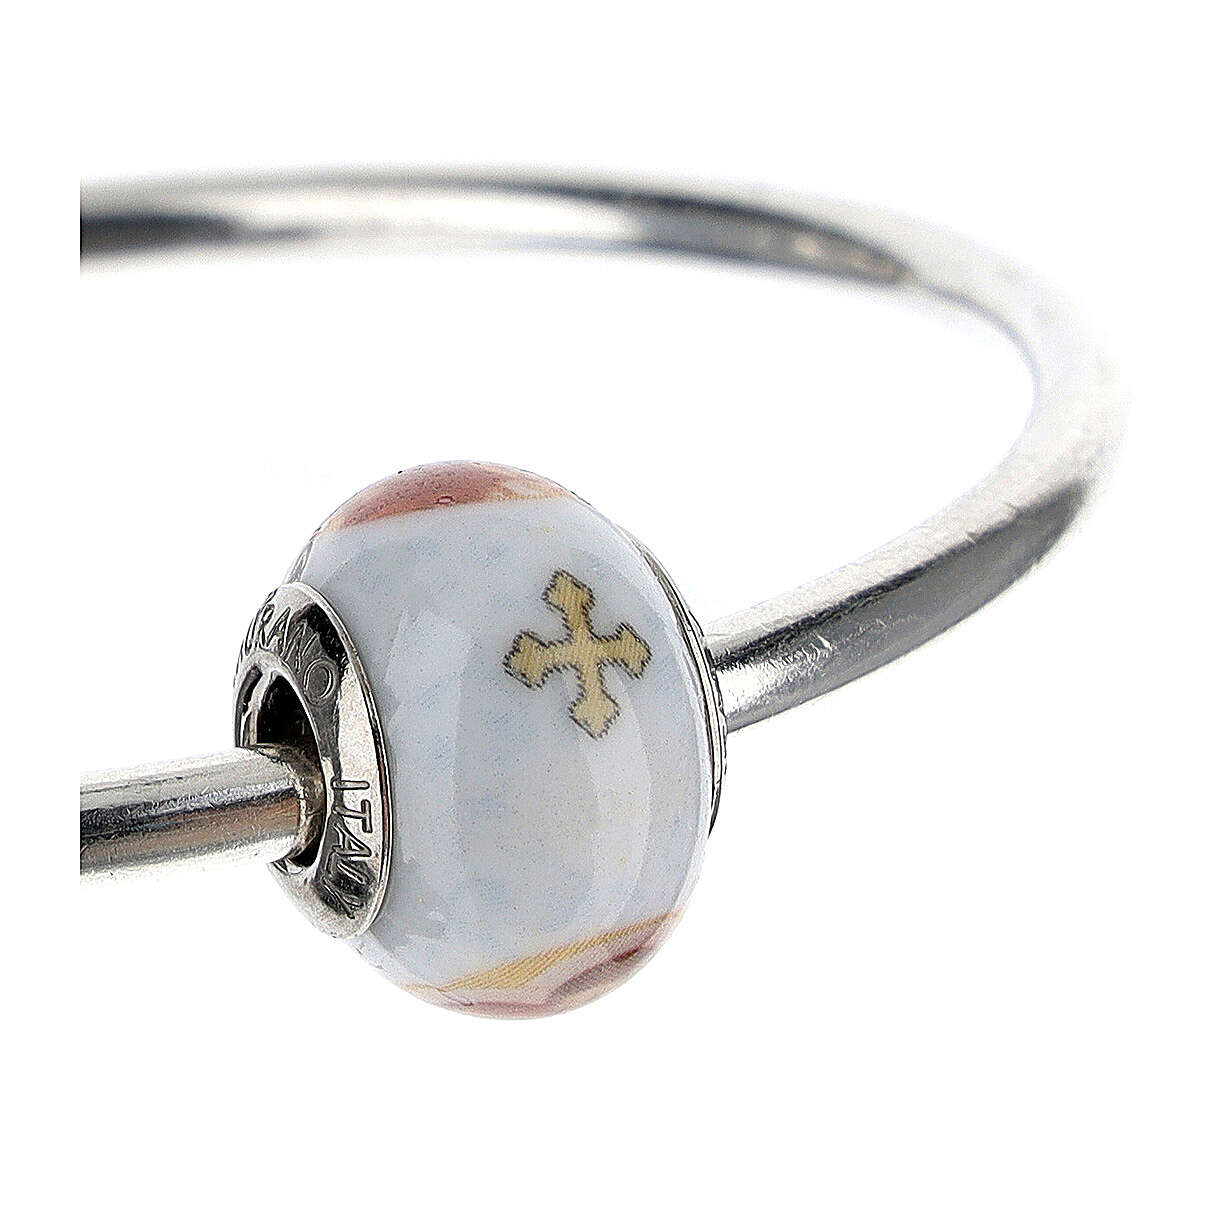 Charm Sagrada Familia para pulseras vidrio Murano plata 925 4